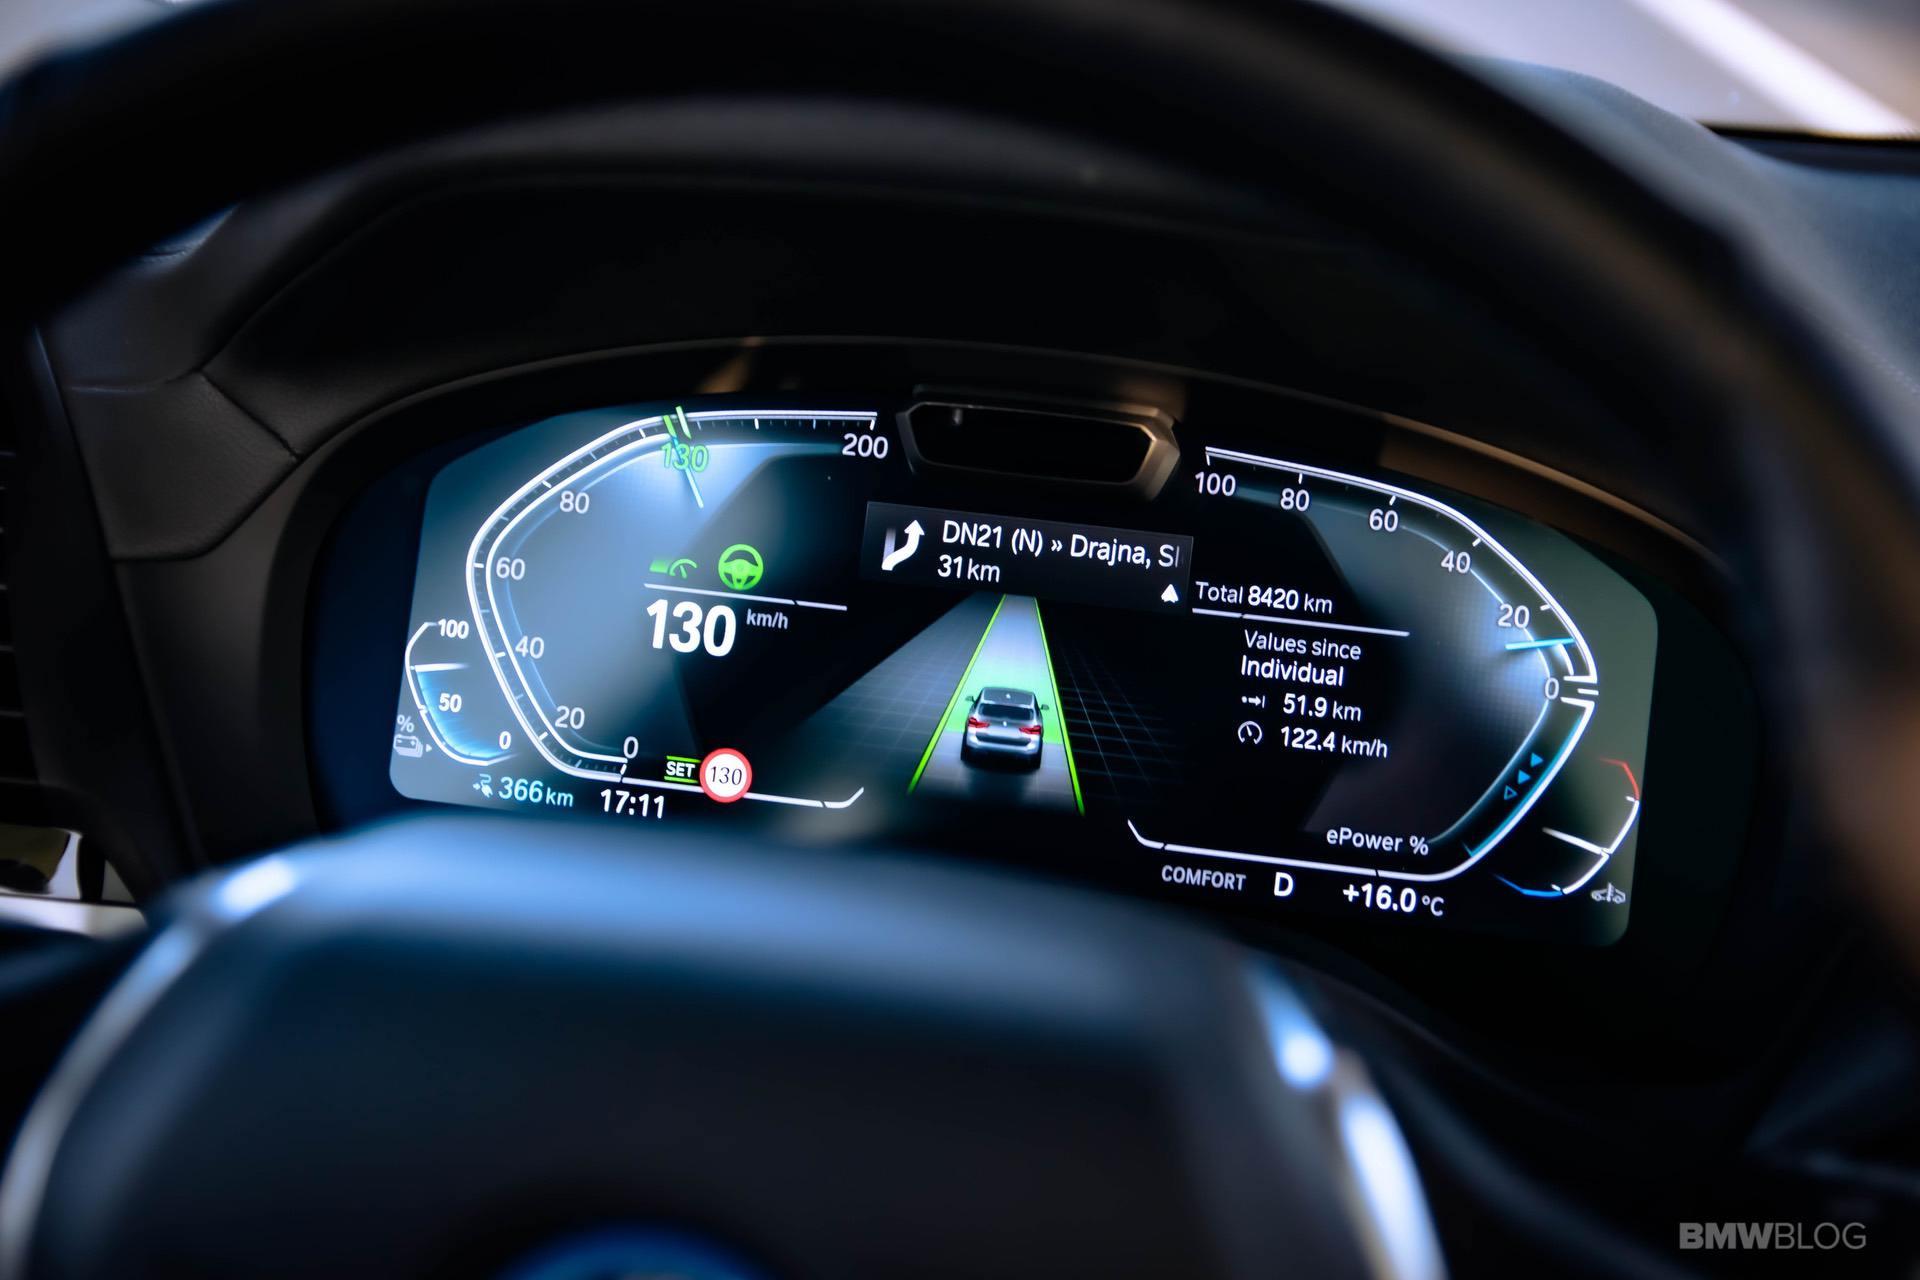 TEST DRIVE: 2021 BMW iX3 Electric SUV – Incremental Steps